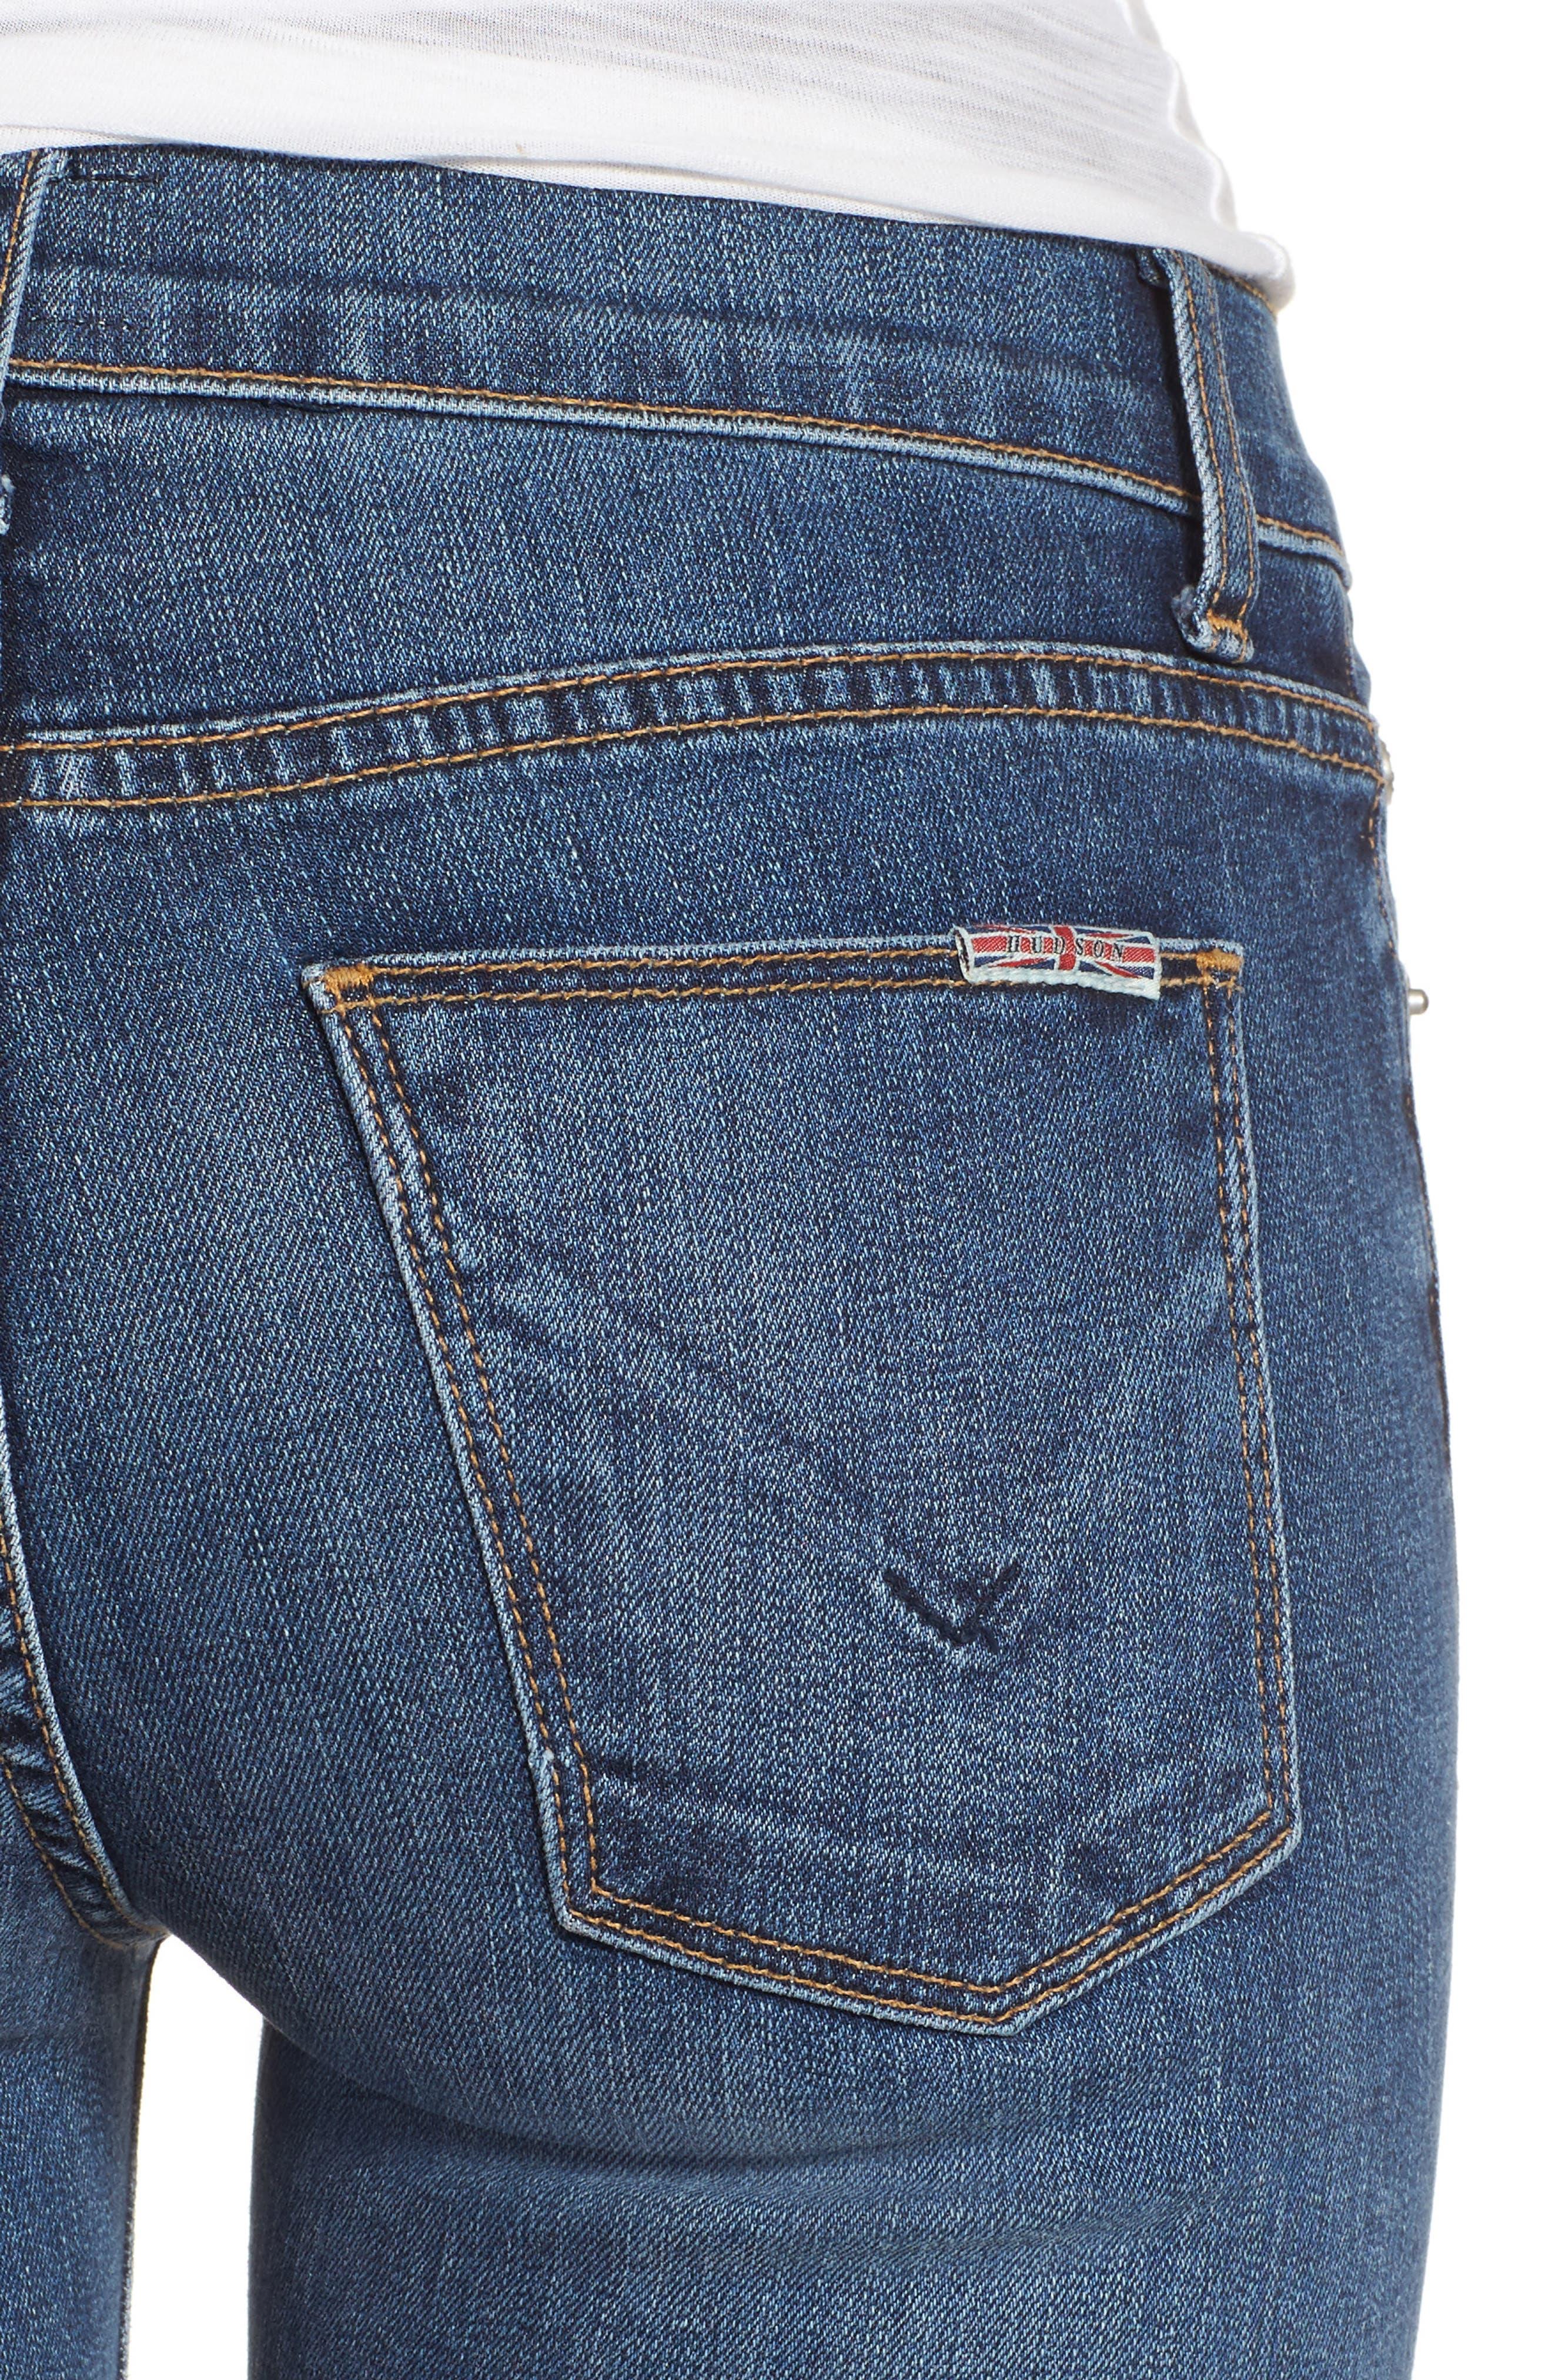 Drew Bootcut Jeans,                             Alternate thumbnail 4, color,                             UNFAMED